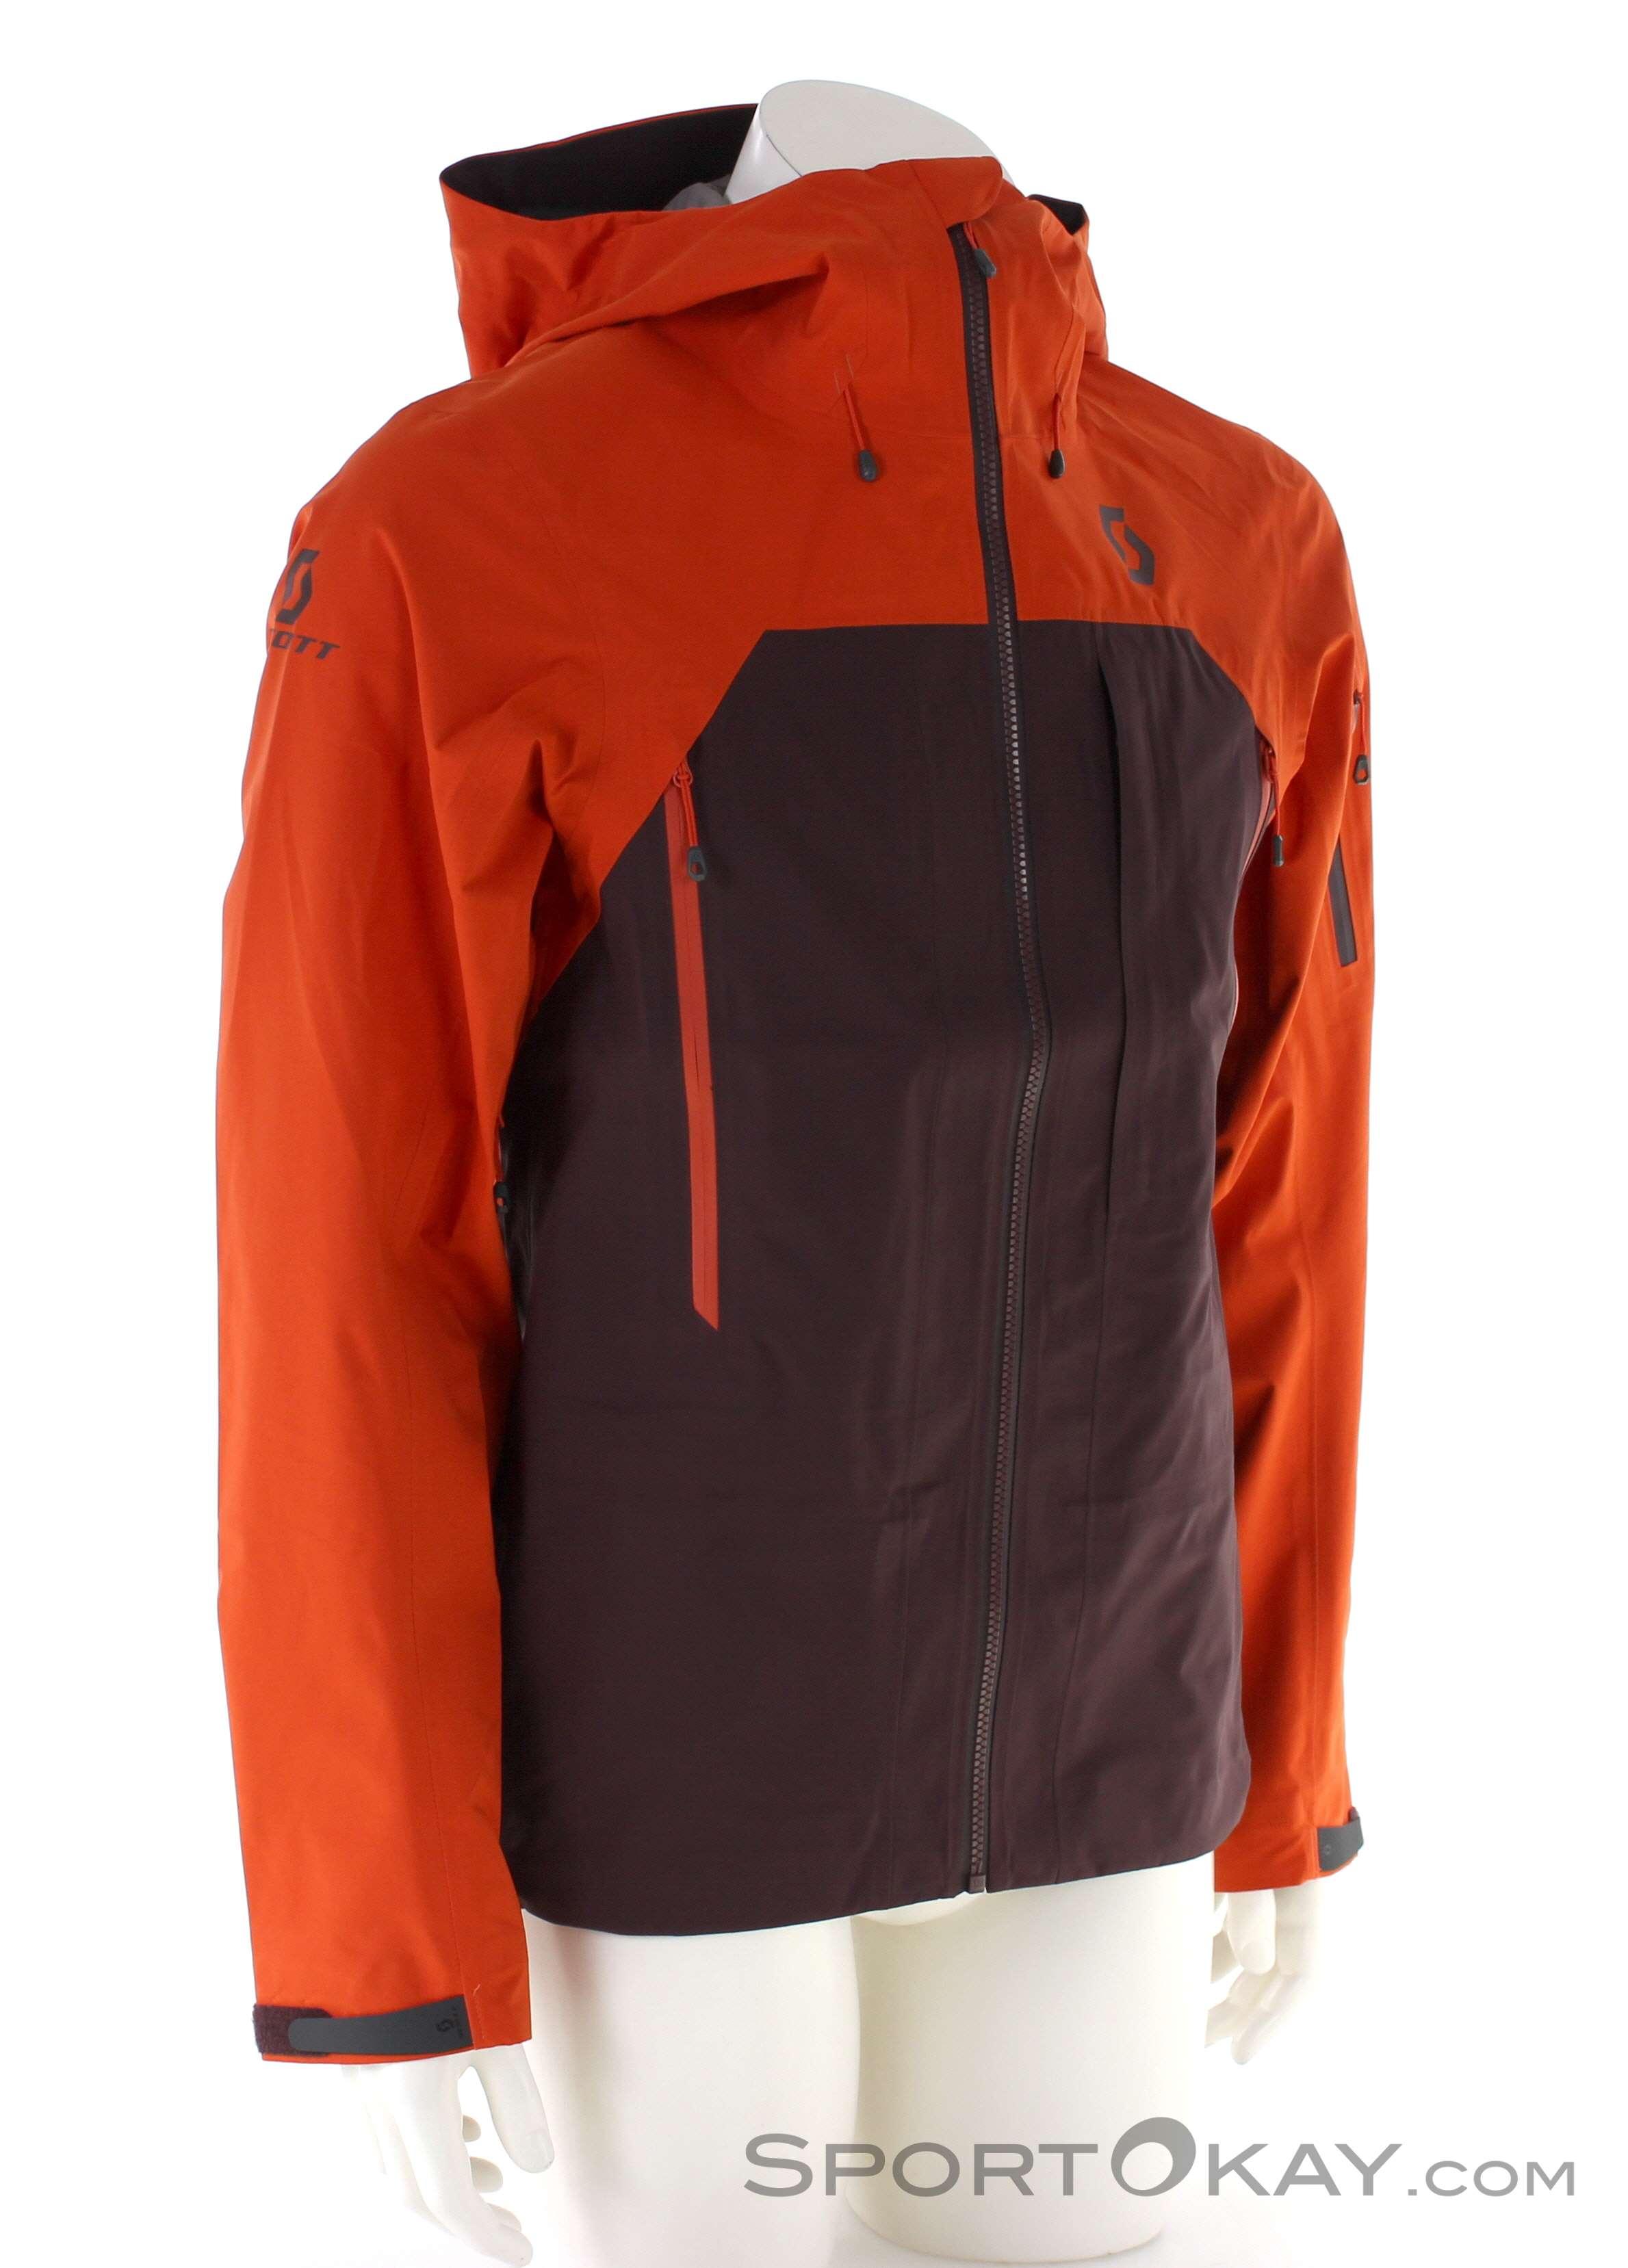 Scott Explorair 3L Mens Ski Touring Jacket Jackets